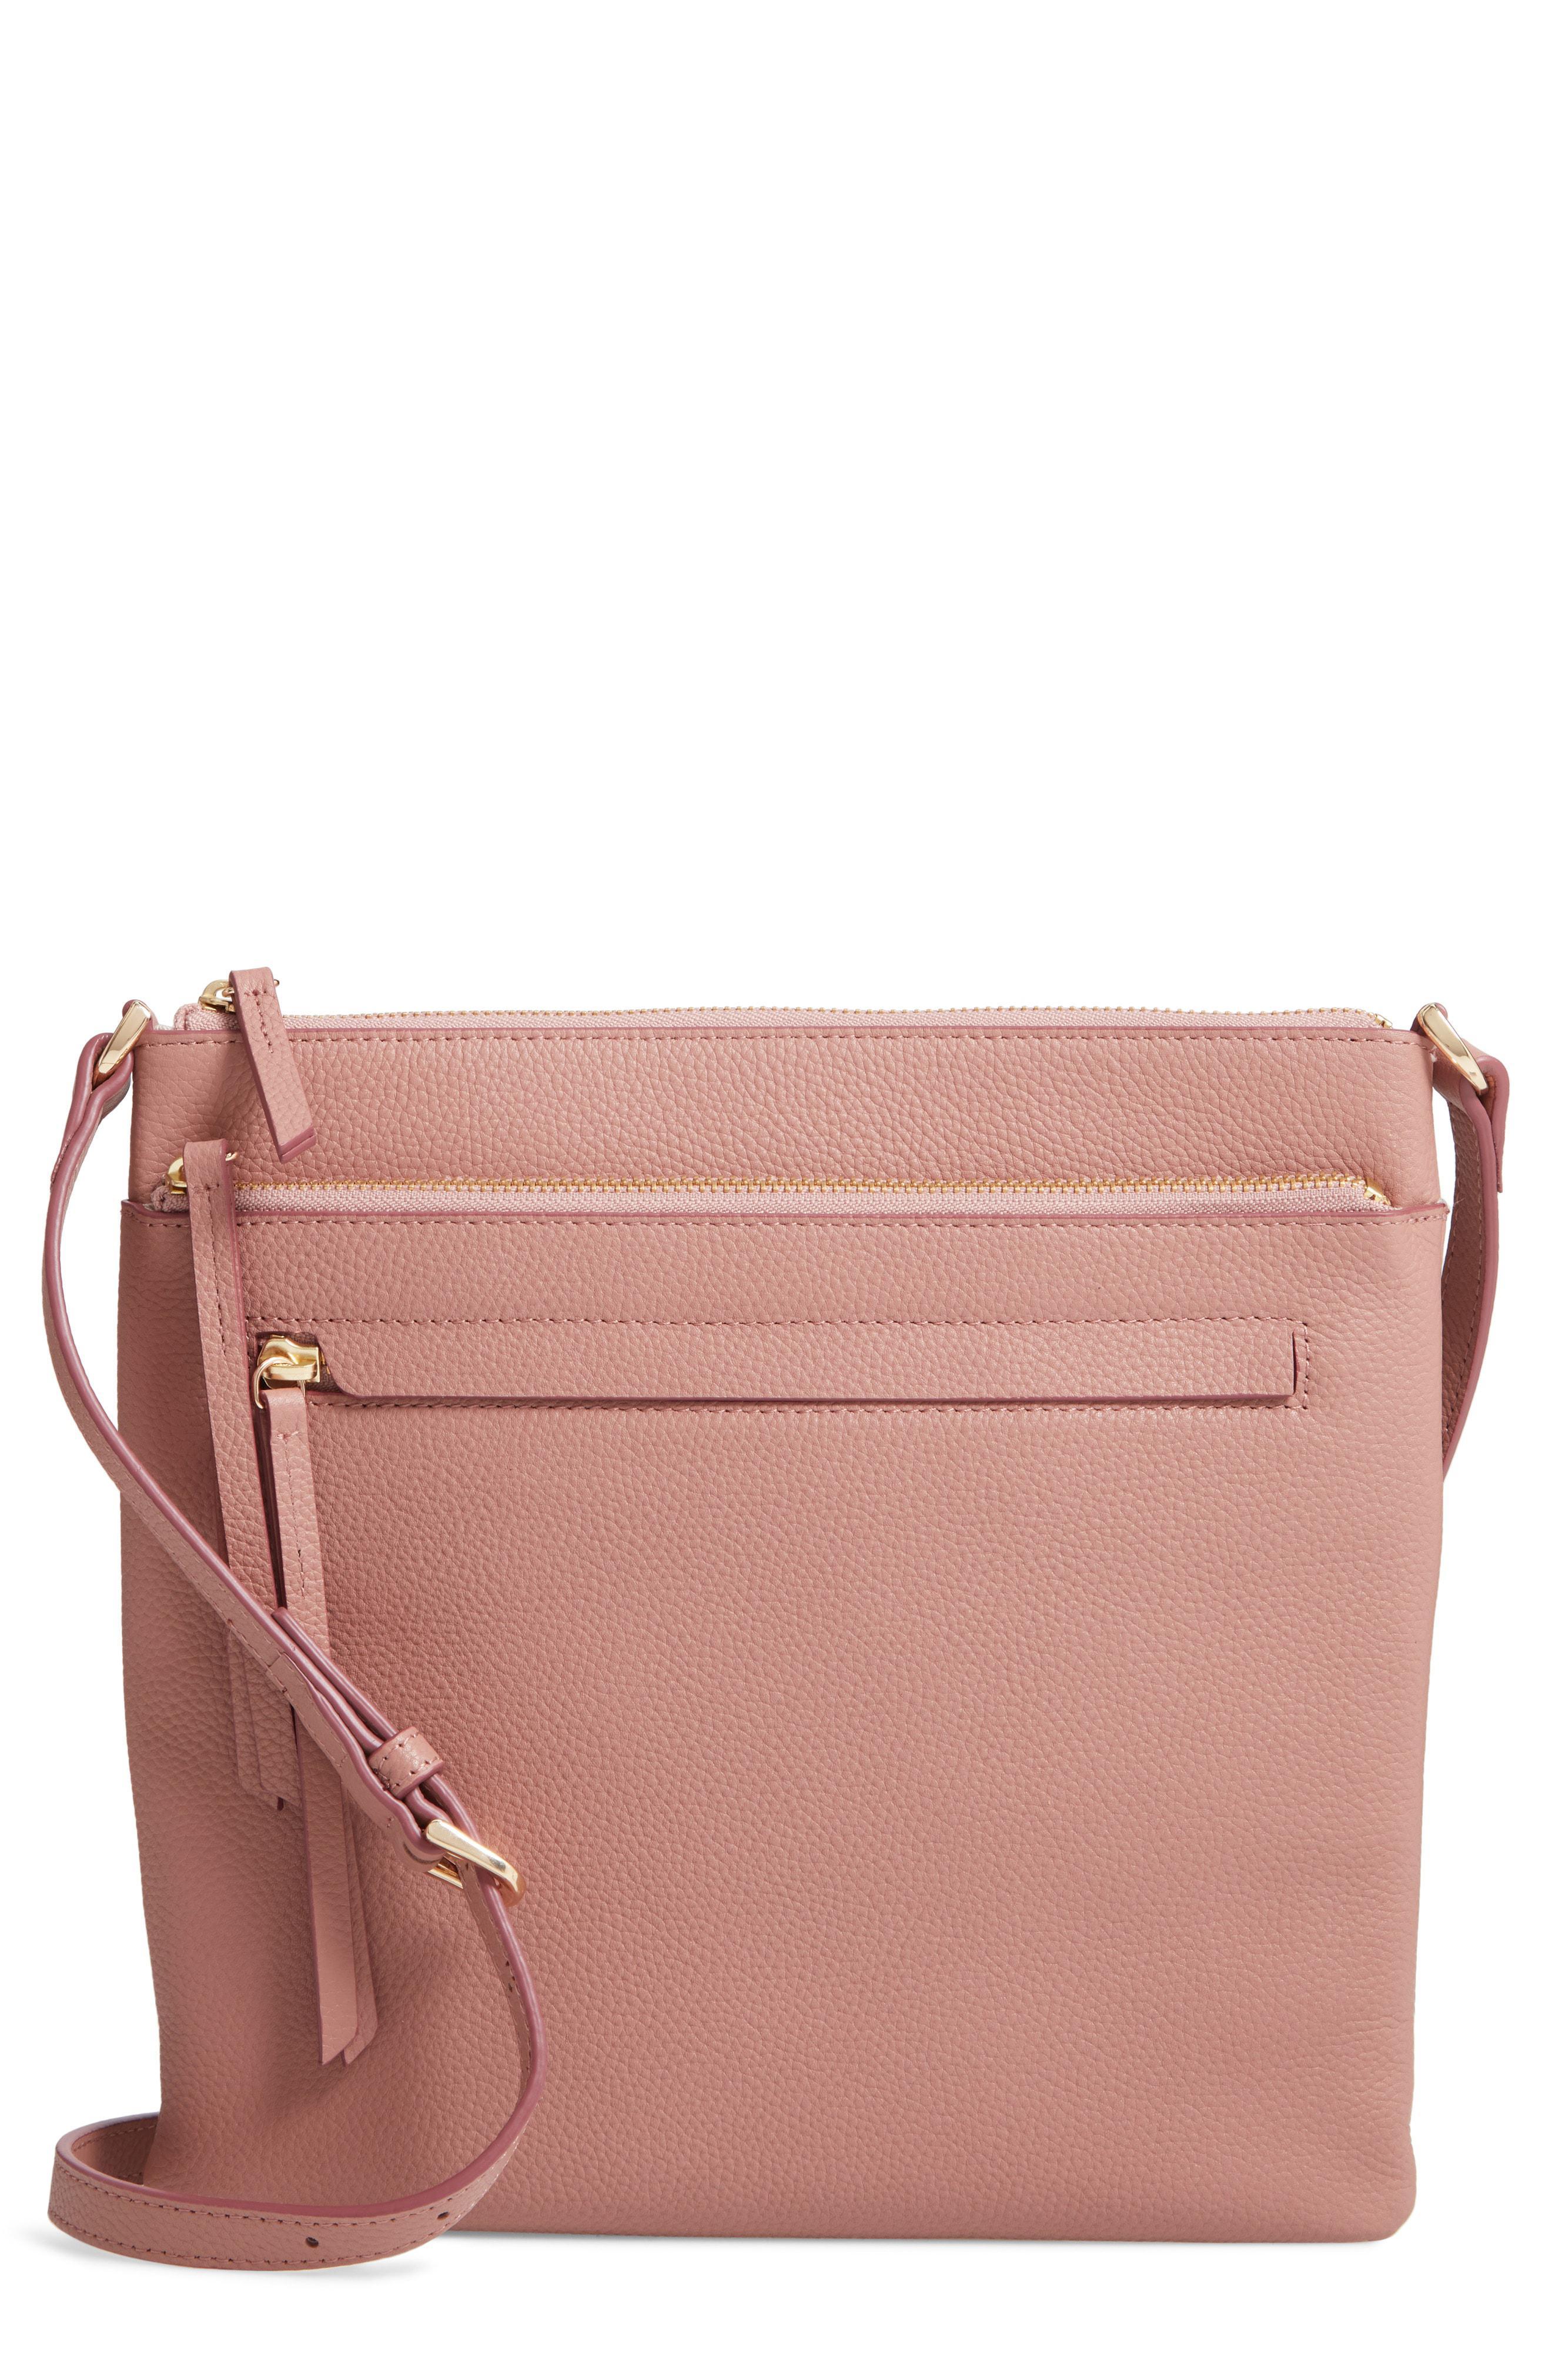 Lyst - Nordstrom Finn Leather Crossbody Bag - in Pink 617f908090